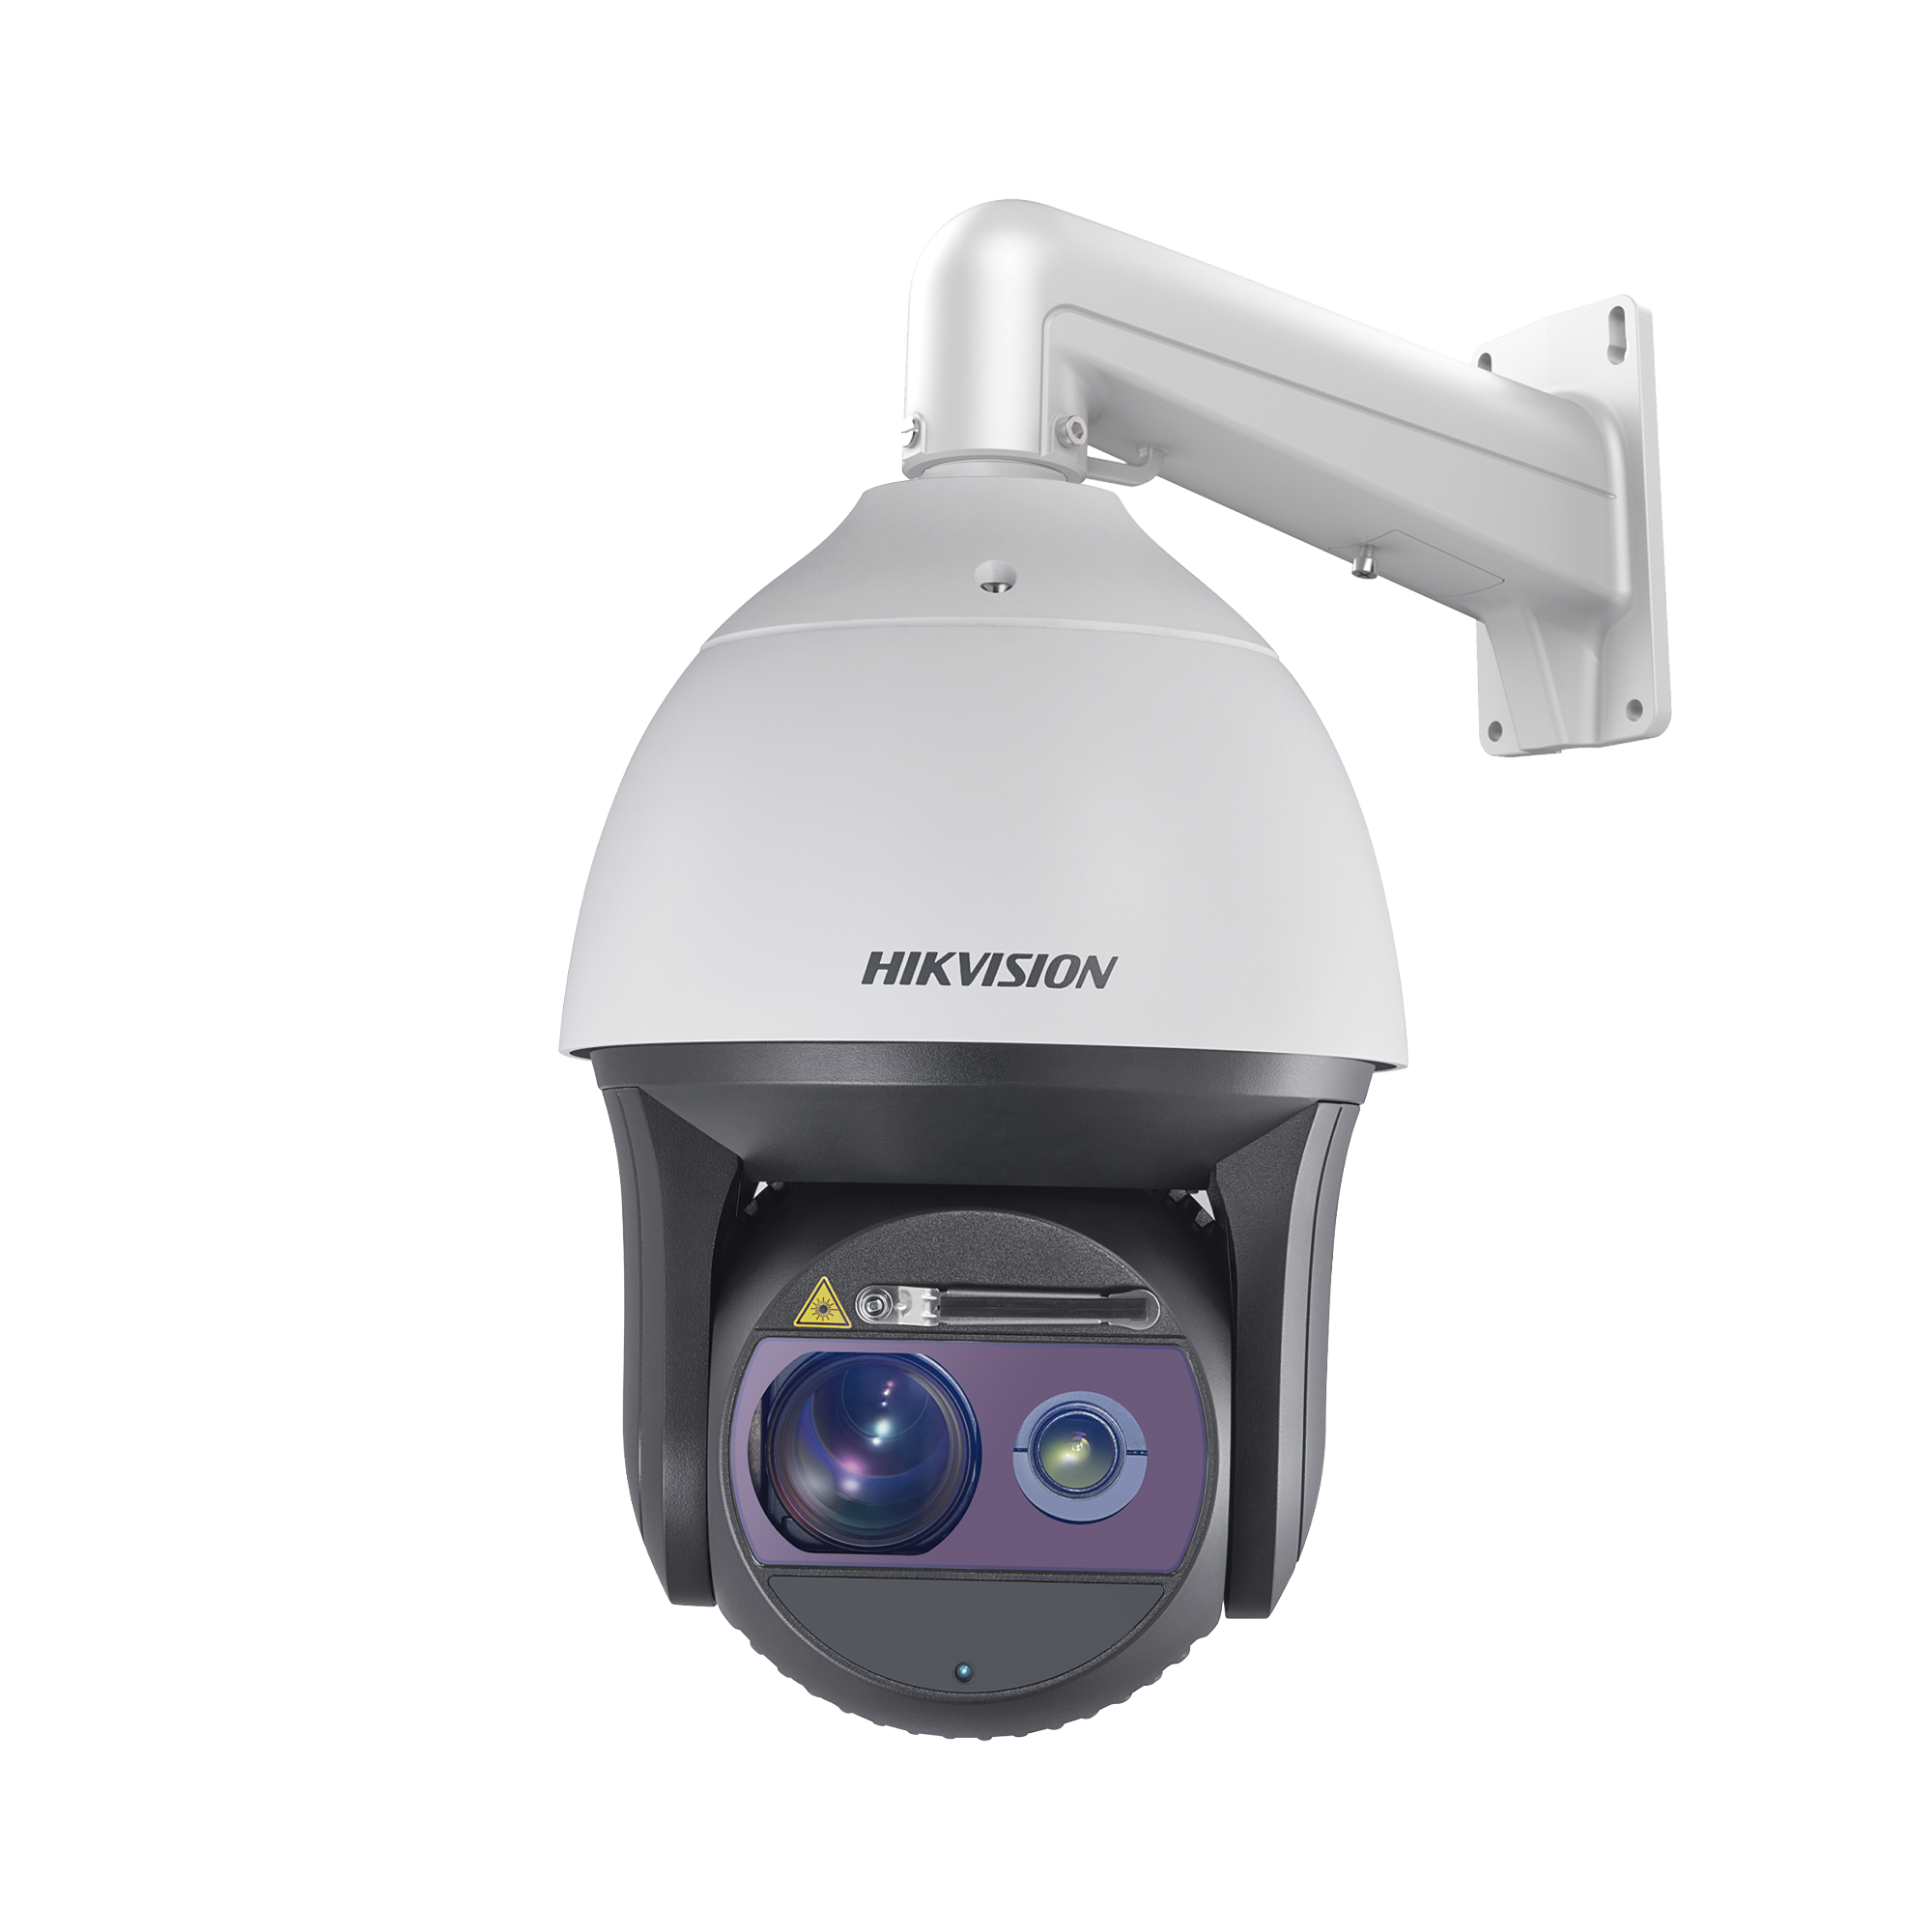 PTZ IP 4 Megapixel / 36X Zoom / 500 mts IR Laser / AutoSeguimiento 2.0 / WDR 140 dB / EIS / Exterior IP67 / Rapid Focus / Wiper / Hi-PoE